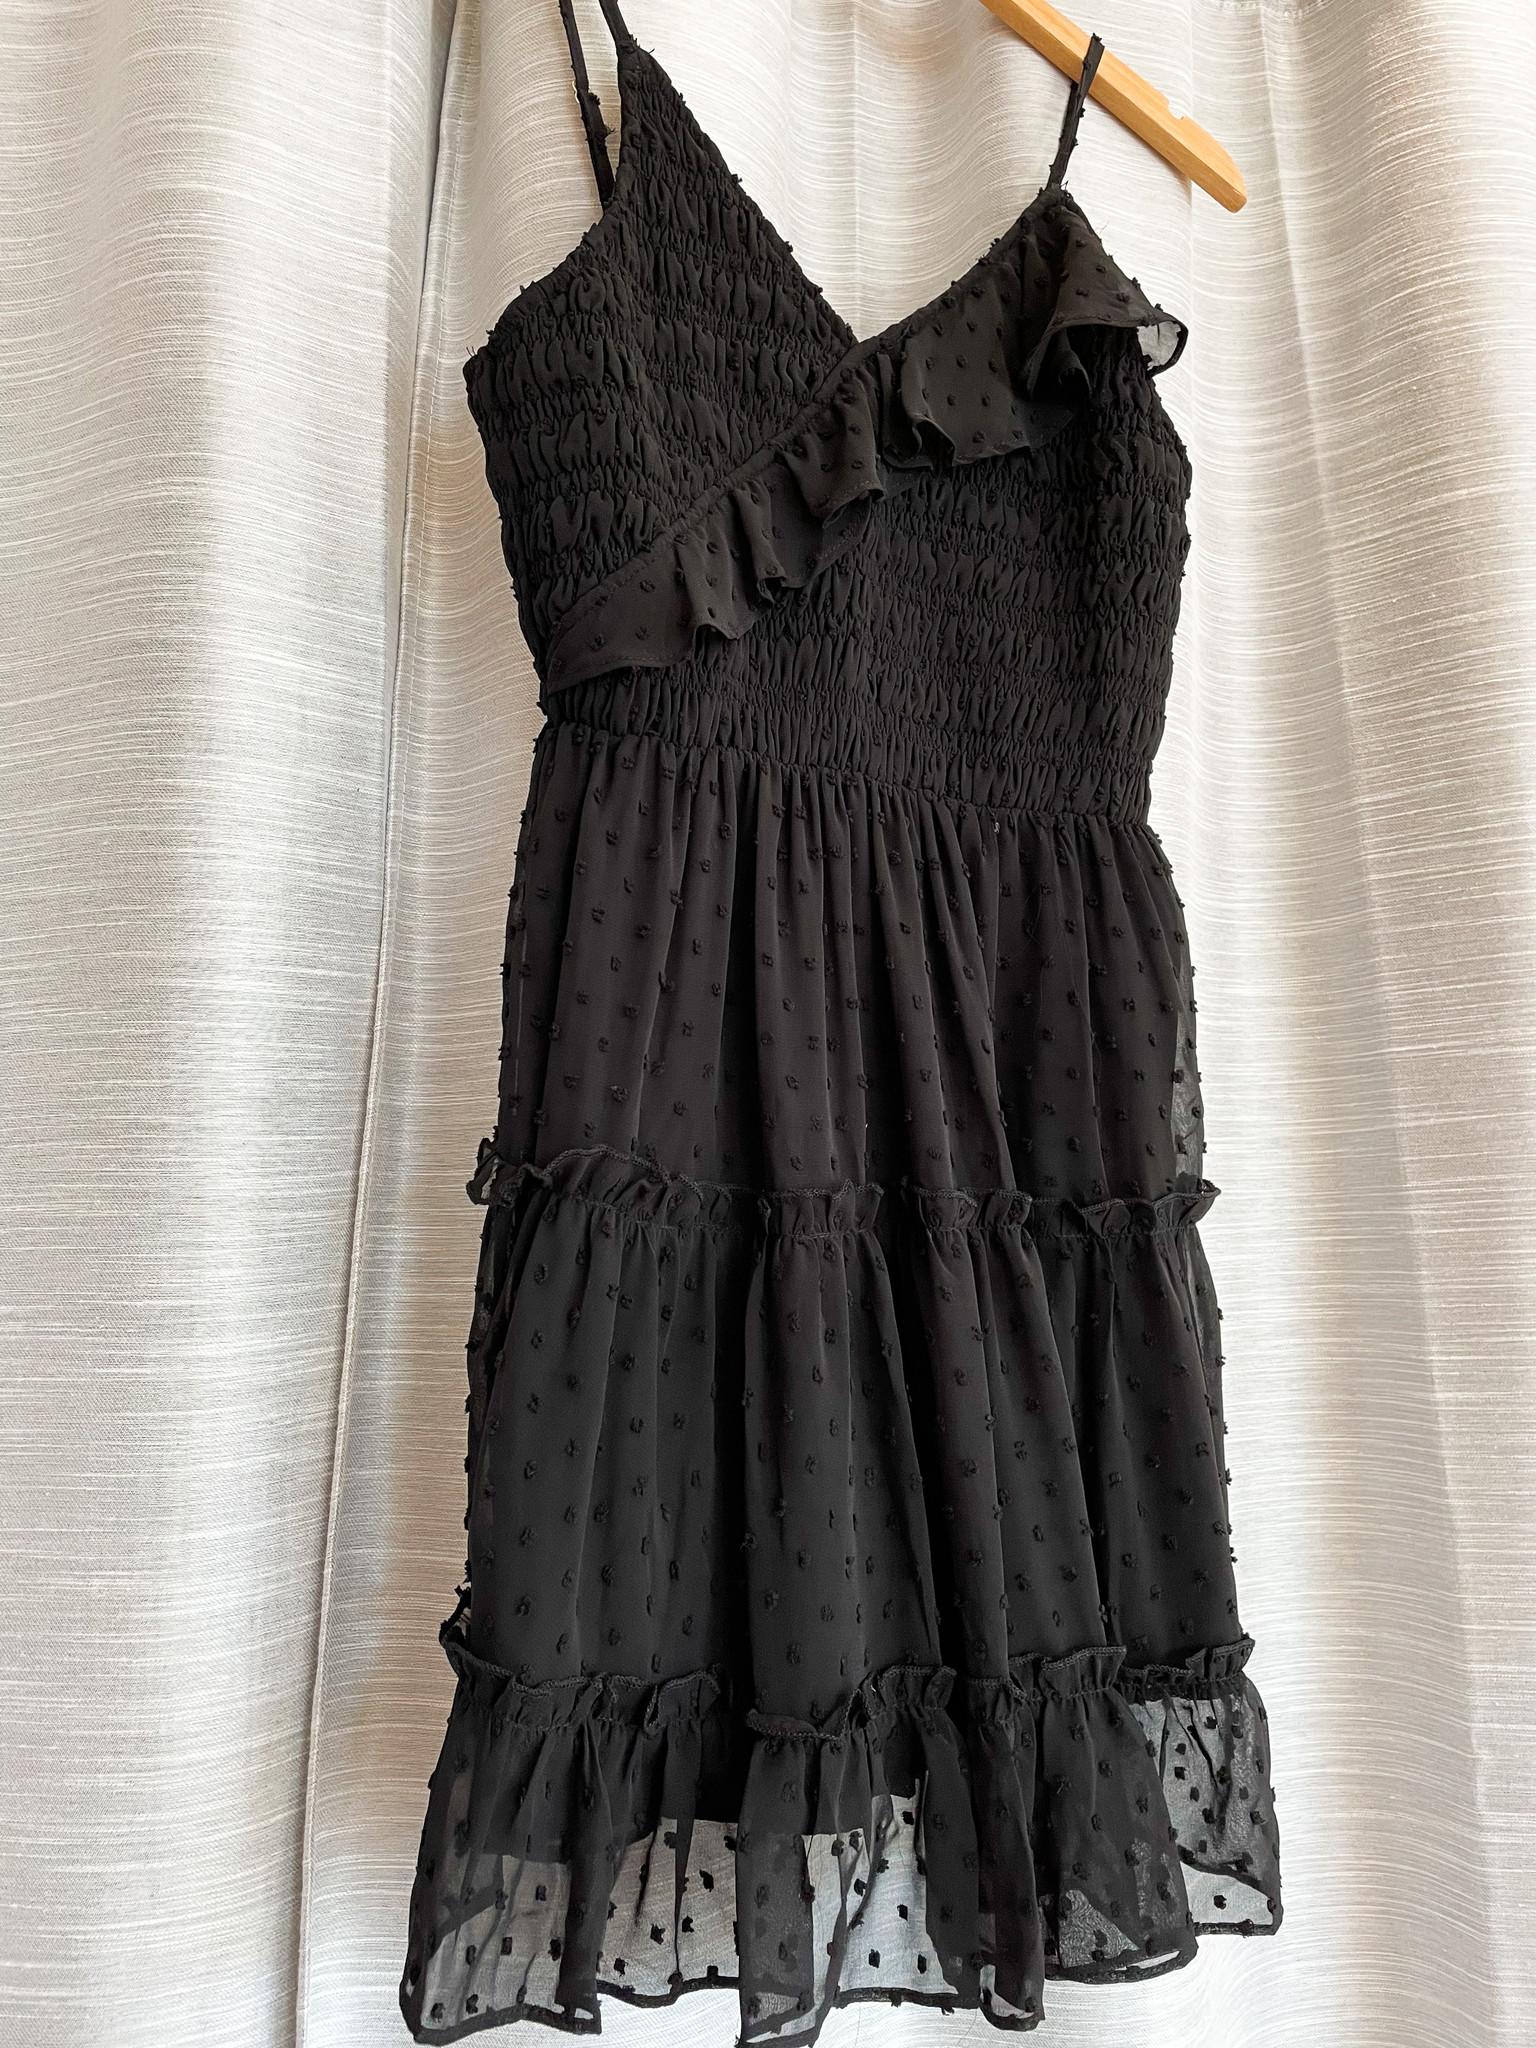 Black Ruffled Smocked Dress w/ Adjustable Straps